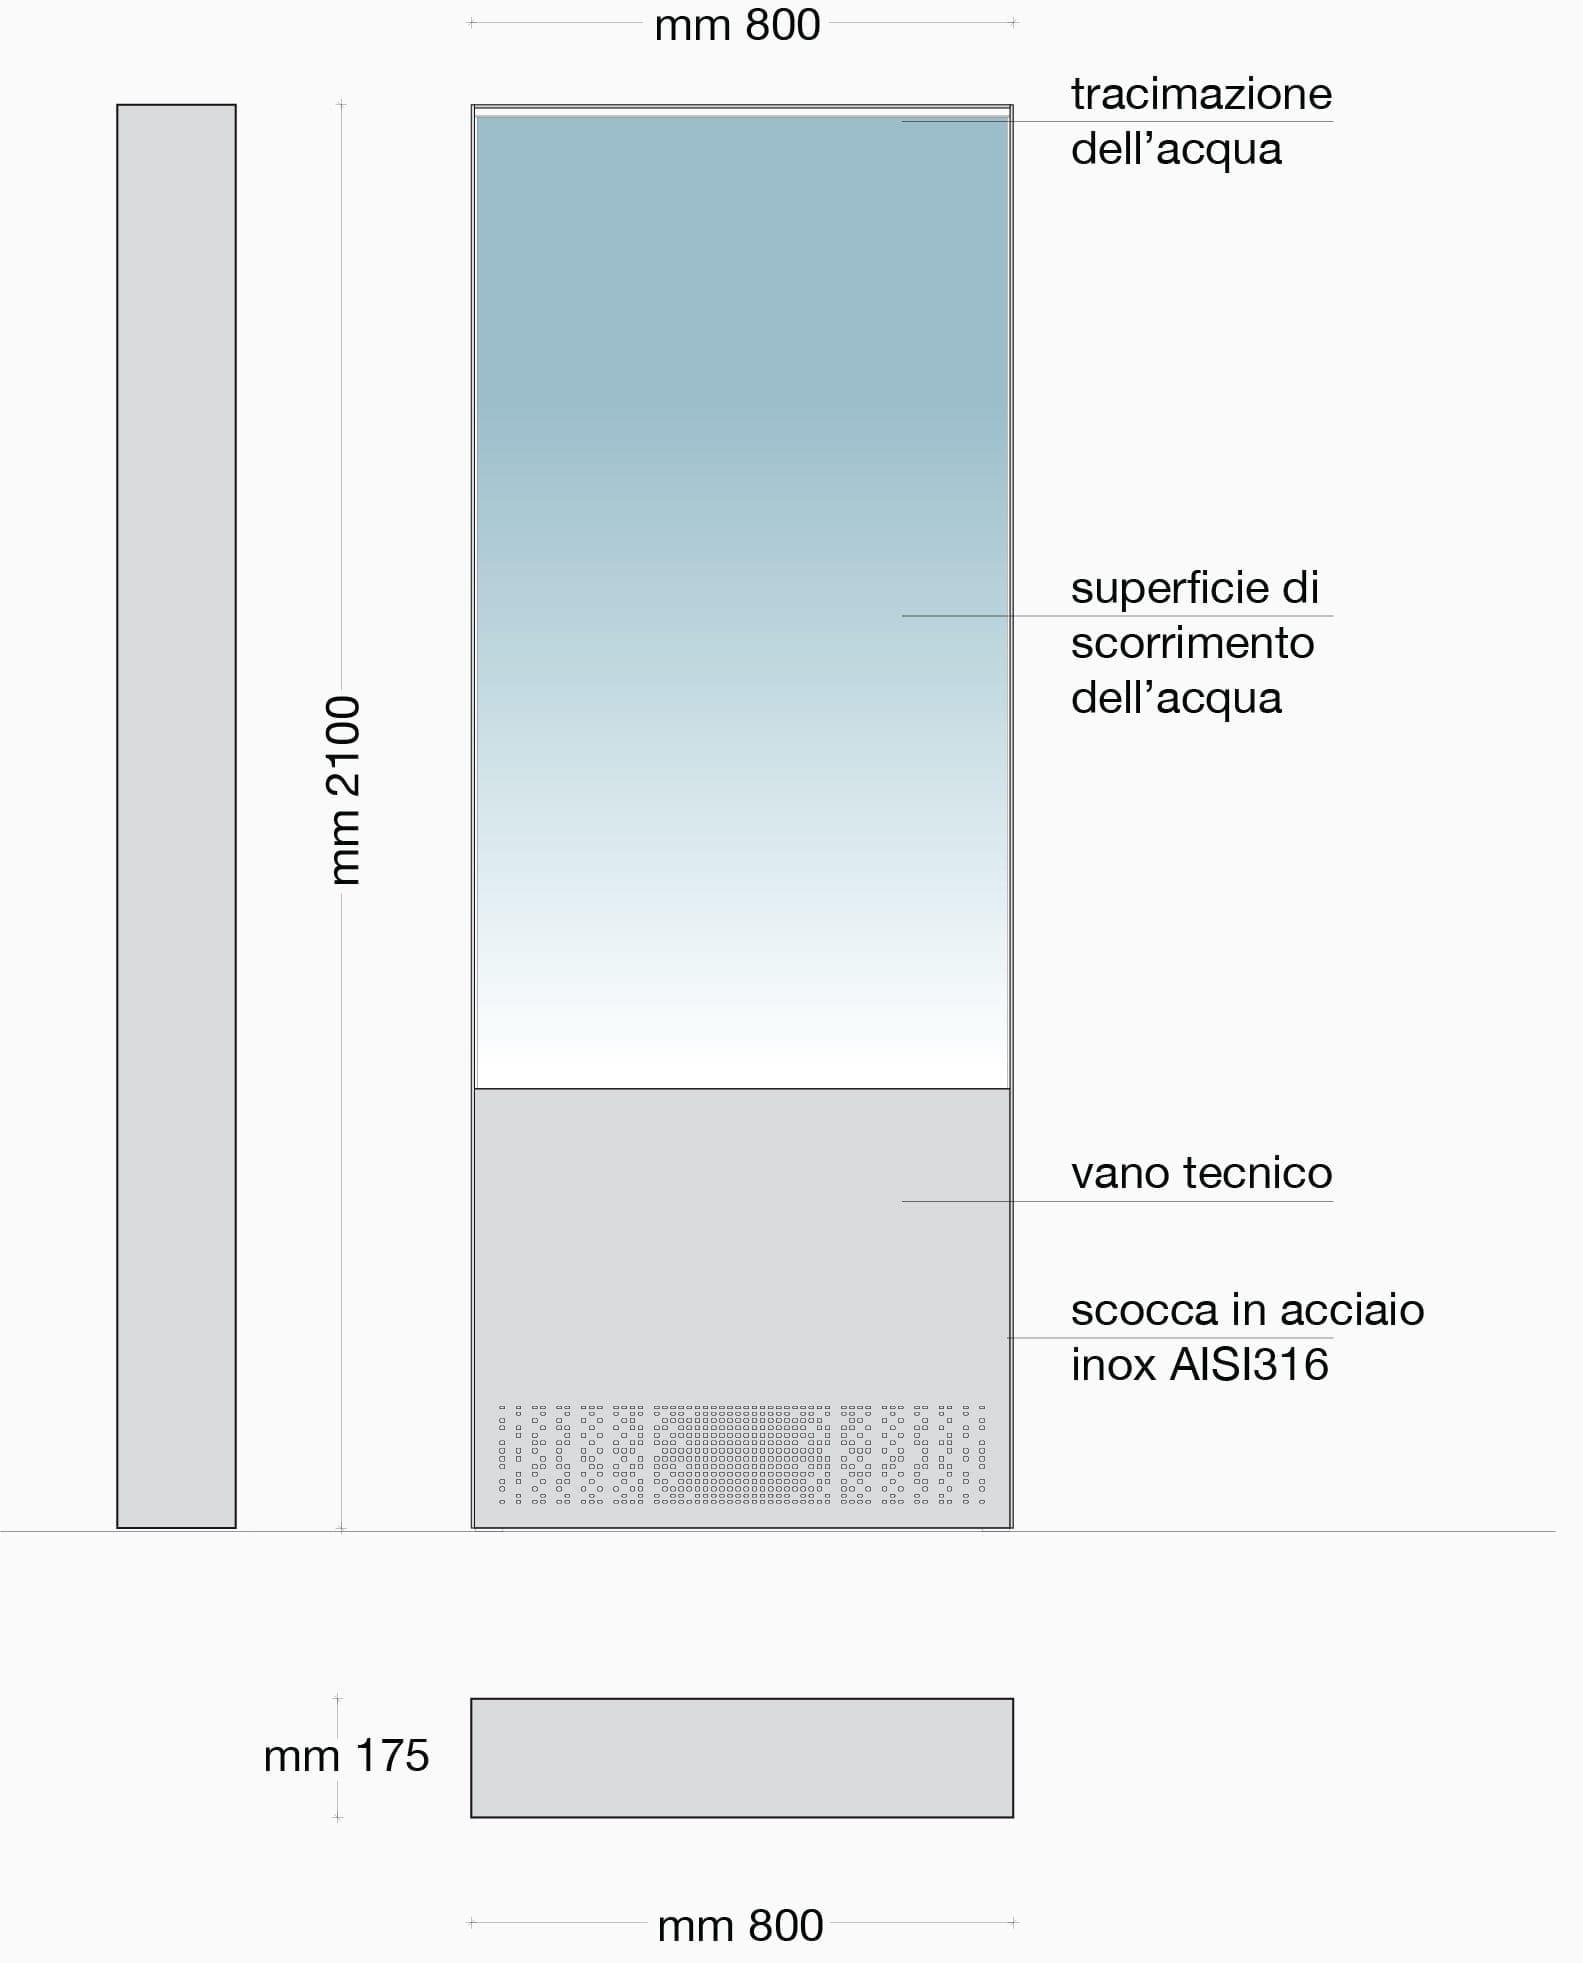 forme-dacqua-le-sirene-fontana-interno-disegno-tecnico